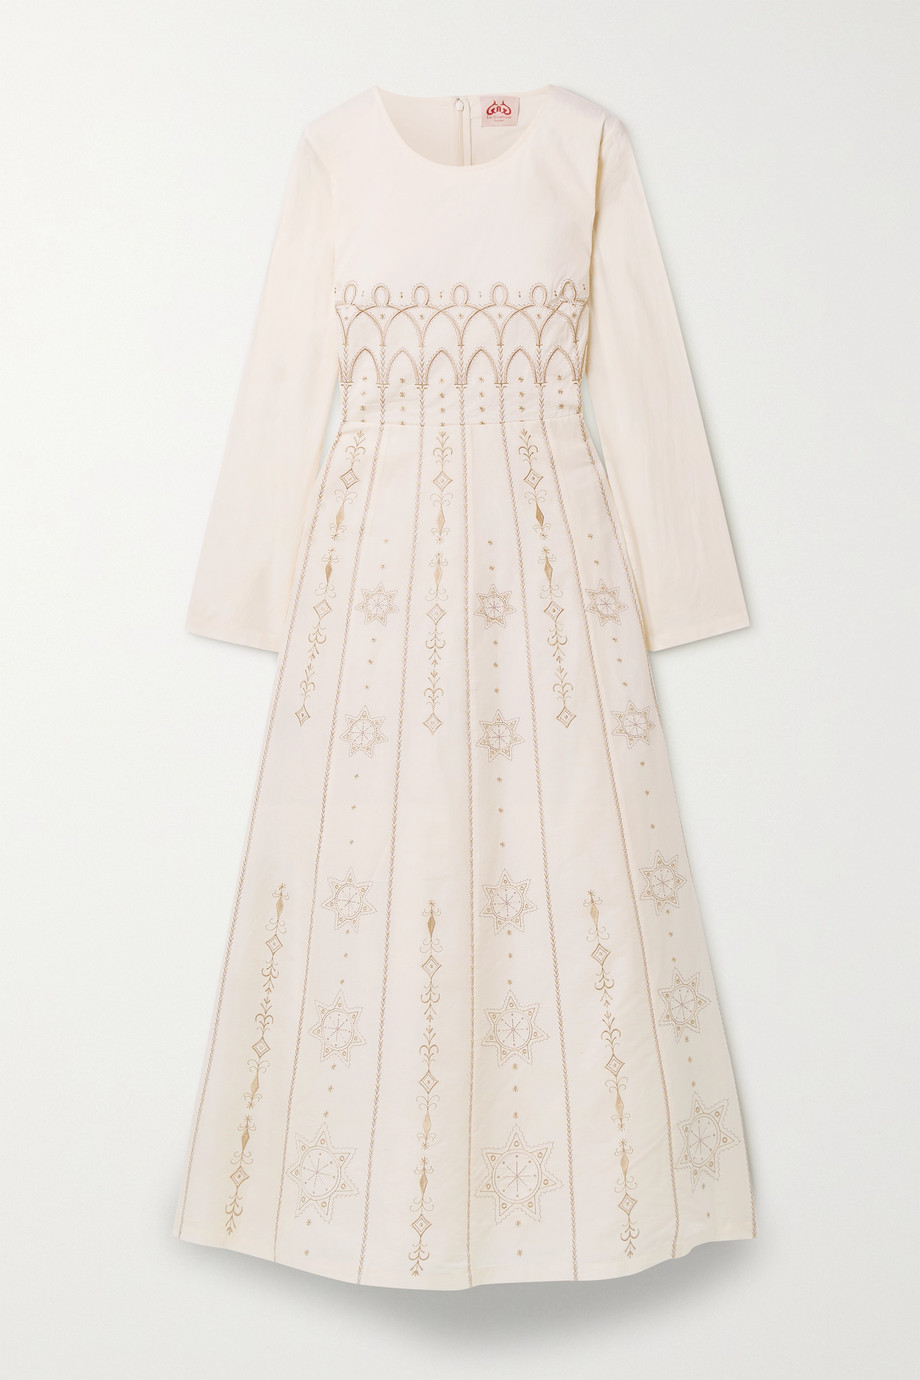 Le Sirenuse Positano Tracey Palazzina embroidered cotton maxi dress